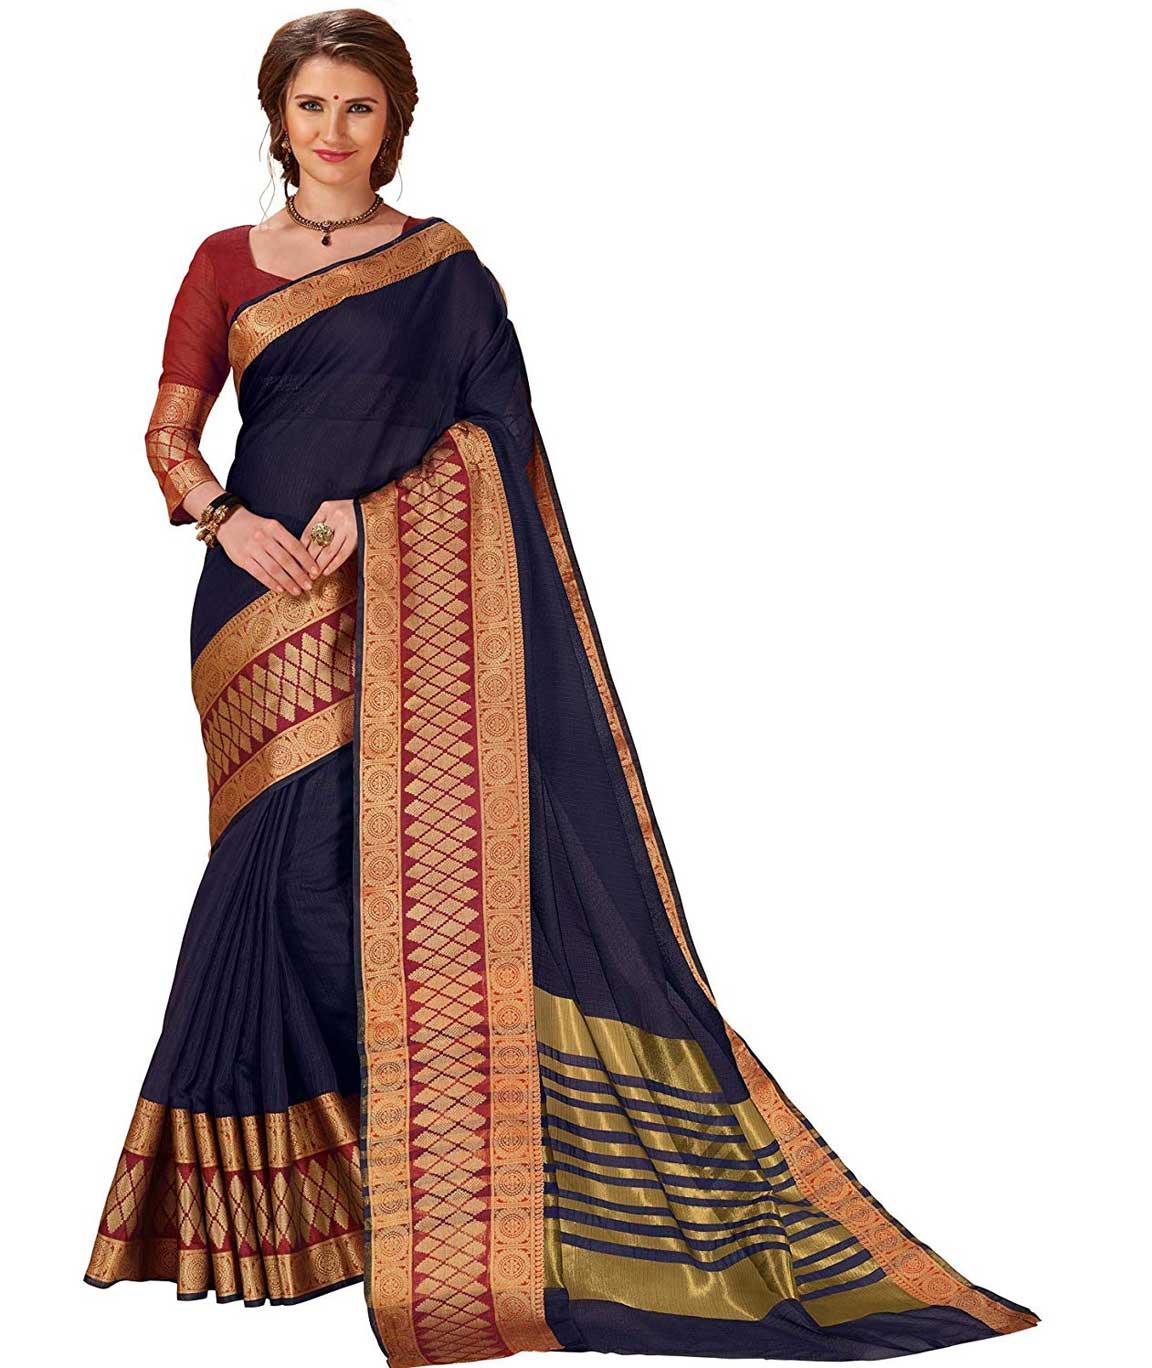 Shangrila Designer Heavy Zari Bordered Natural Color Dyeing Kota Silk Saree With Unstitched Blouse Piece (Black)